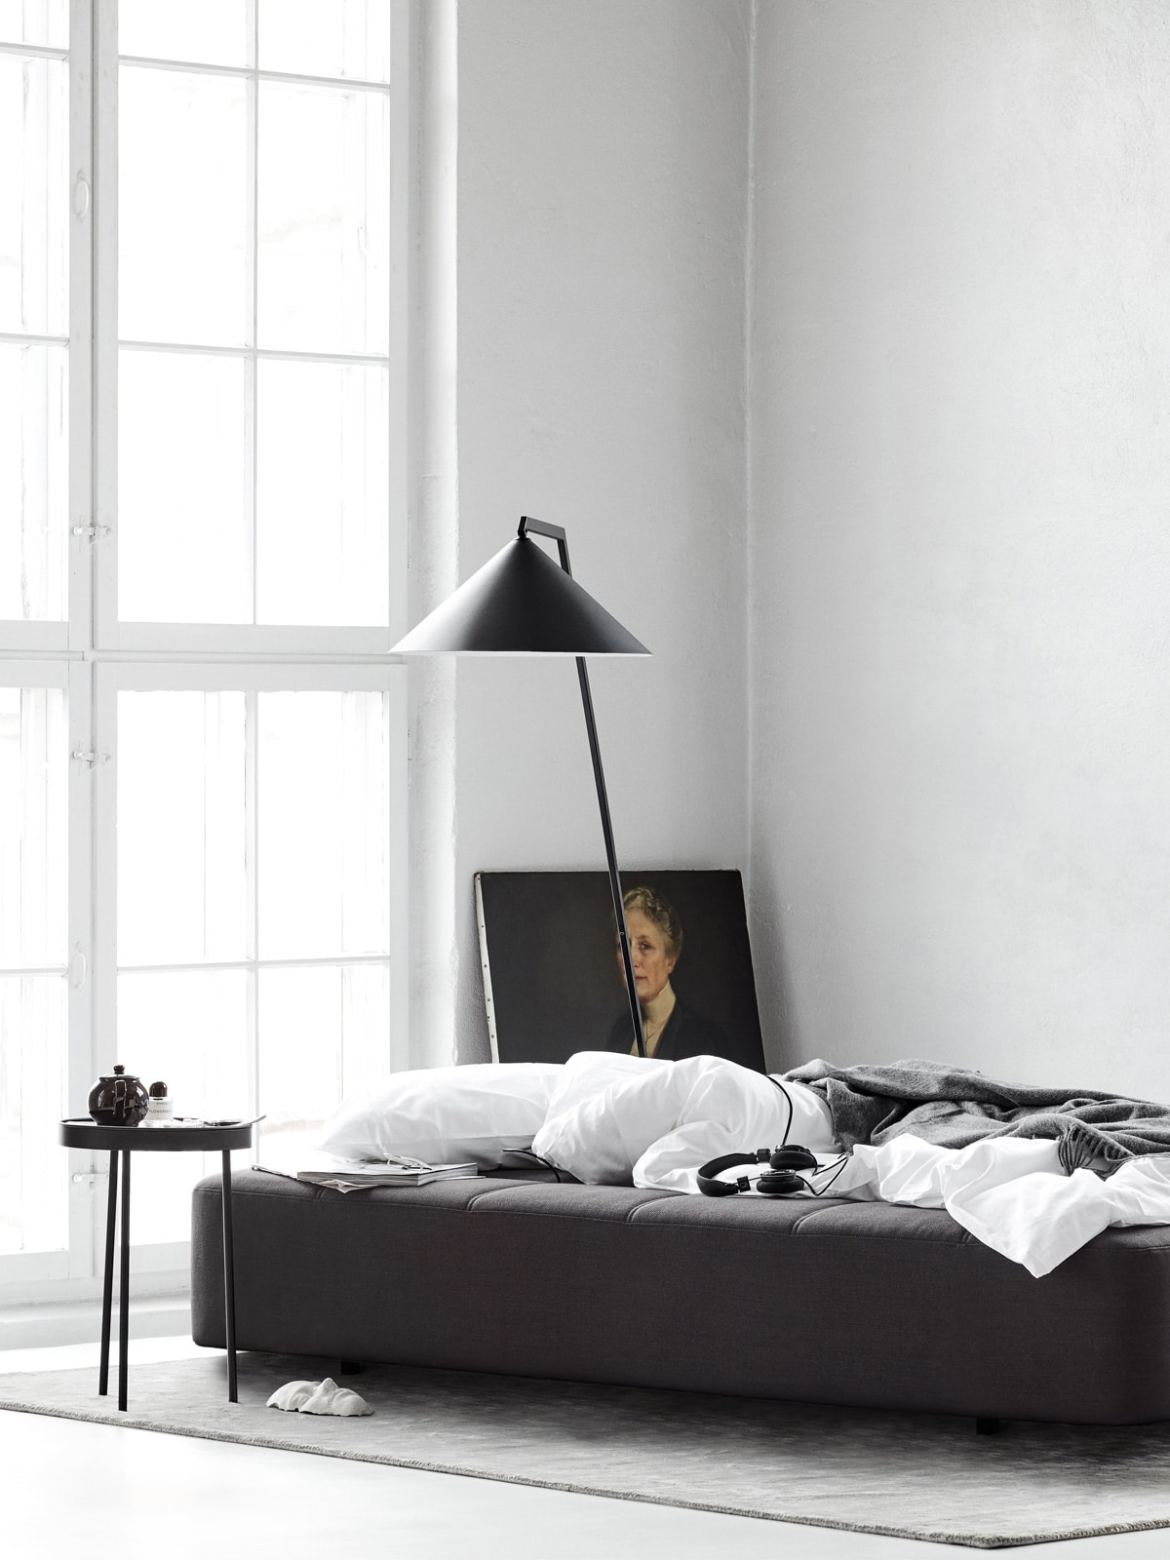 DesignOrt Blog: Bettlampen X Mal Anders Northern Lighting Gear Floor Stehlampe